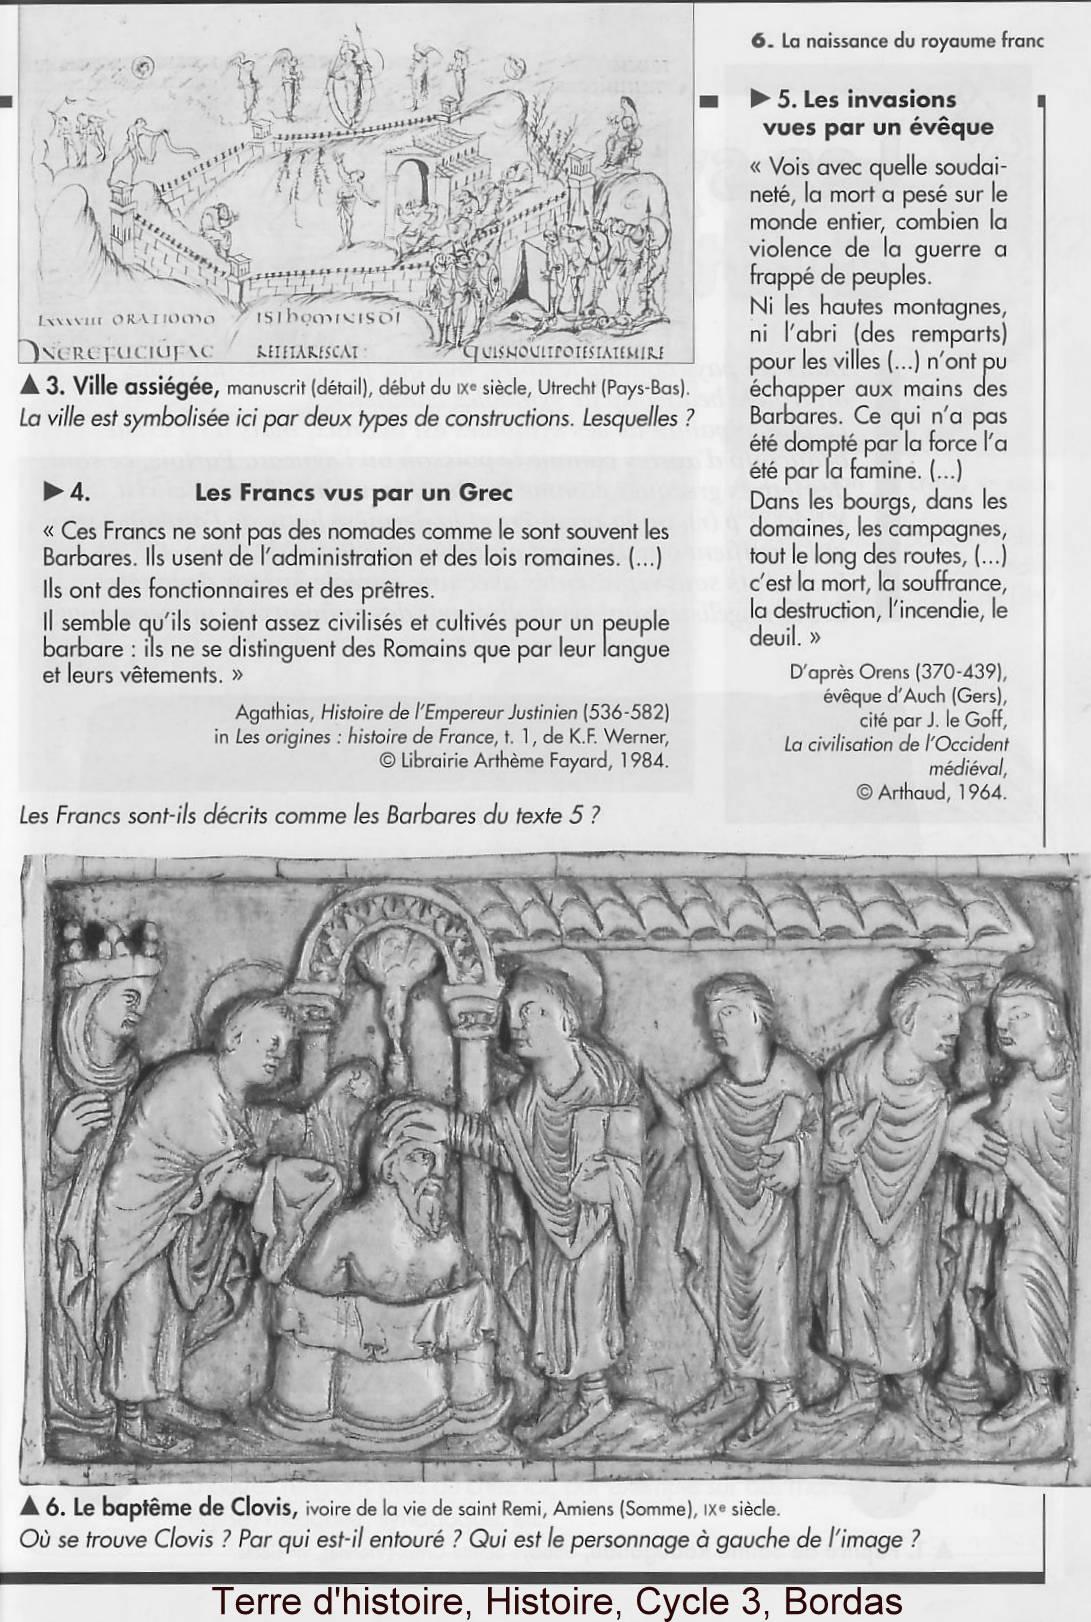 la naissance du royaume franc 2